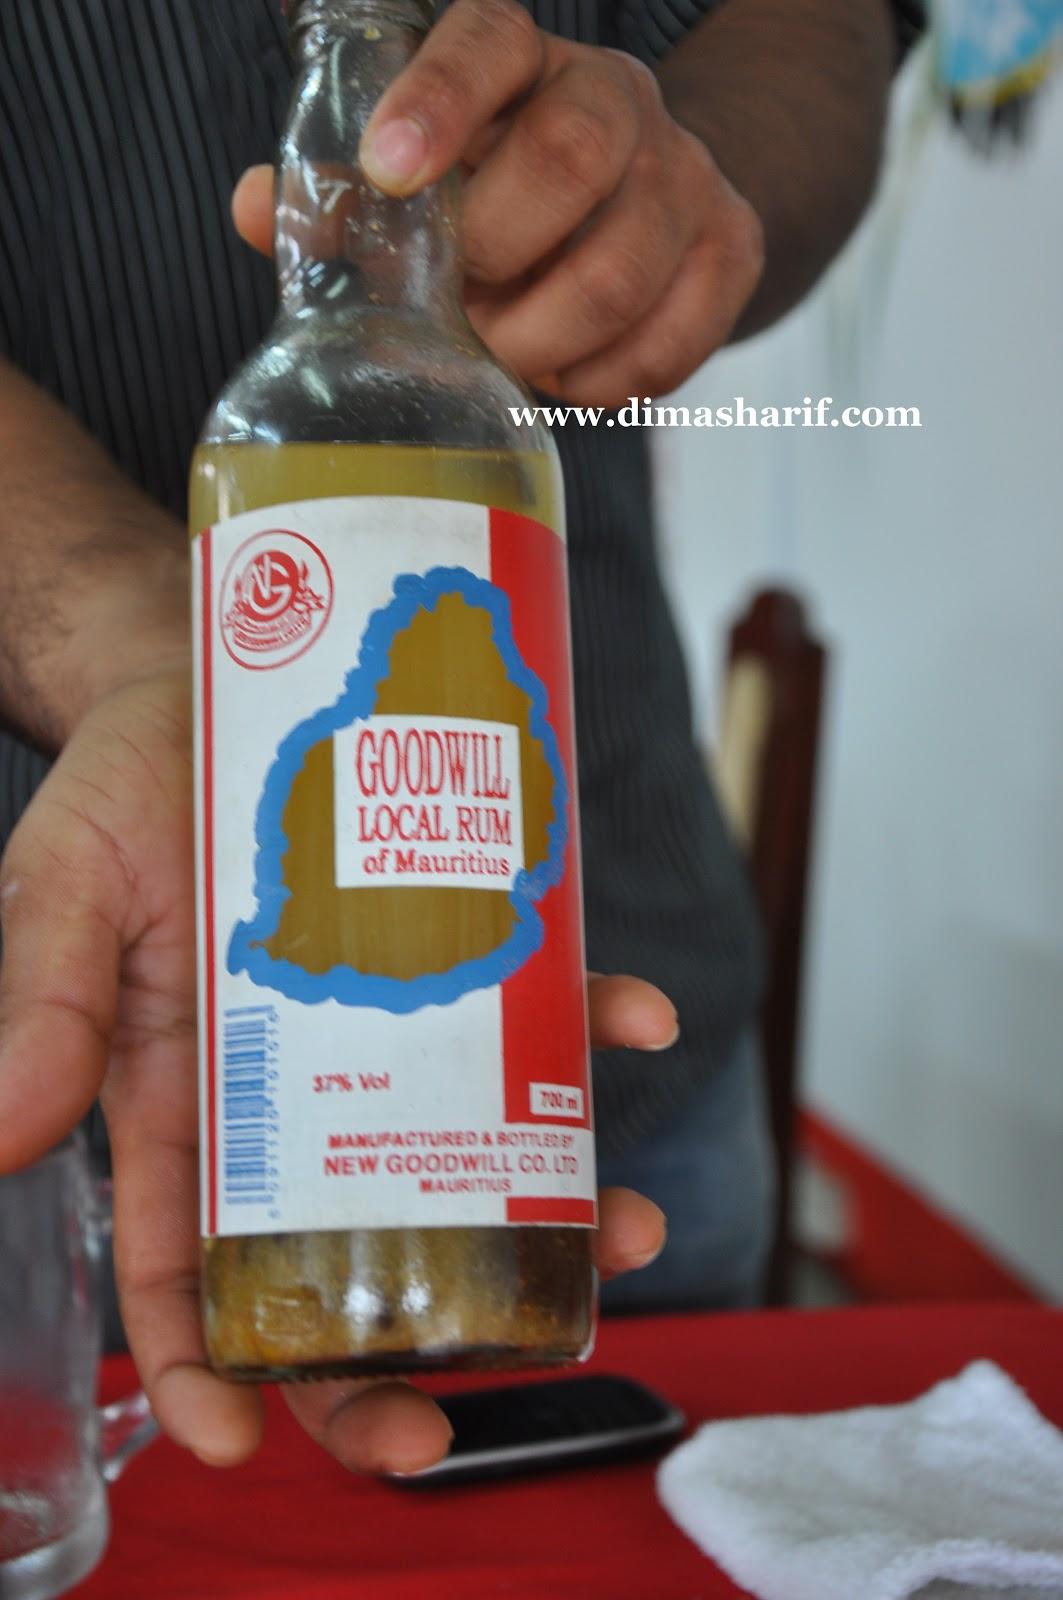 new goodwill mauritius